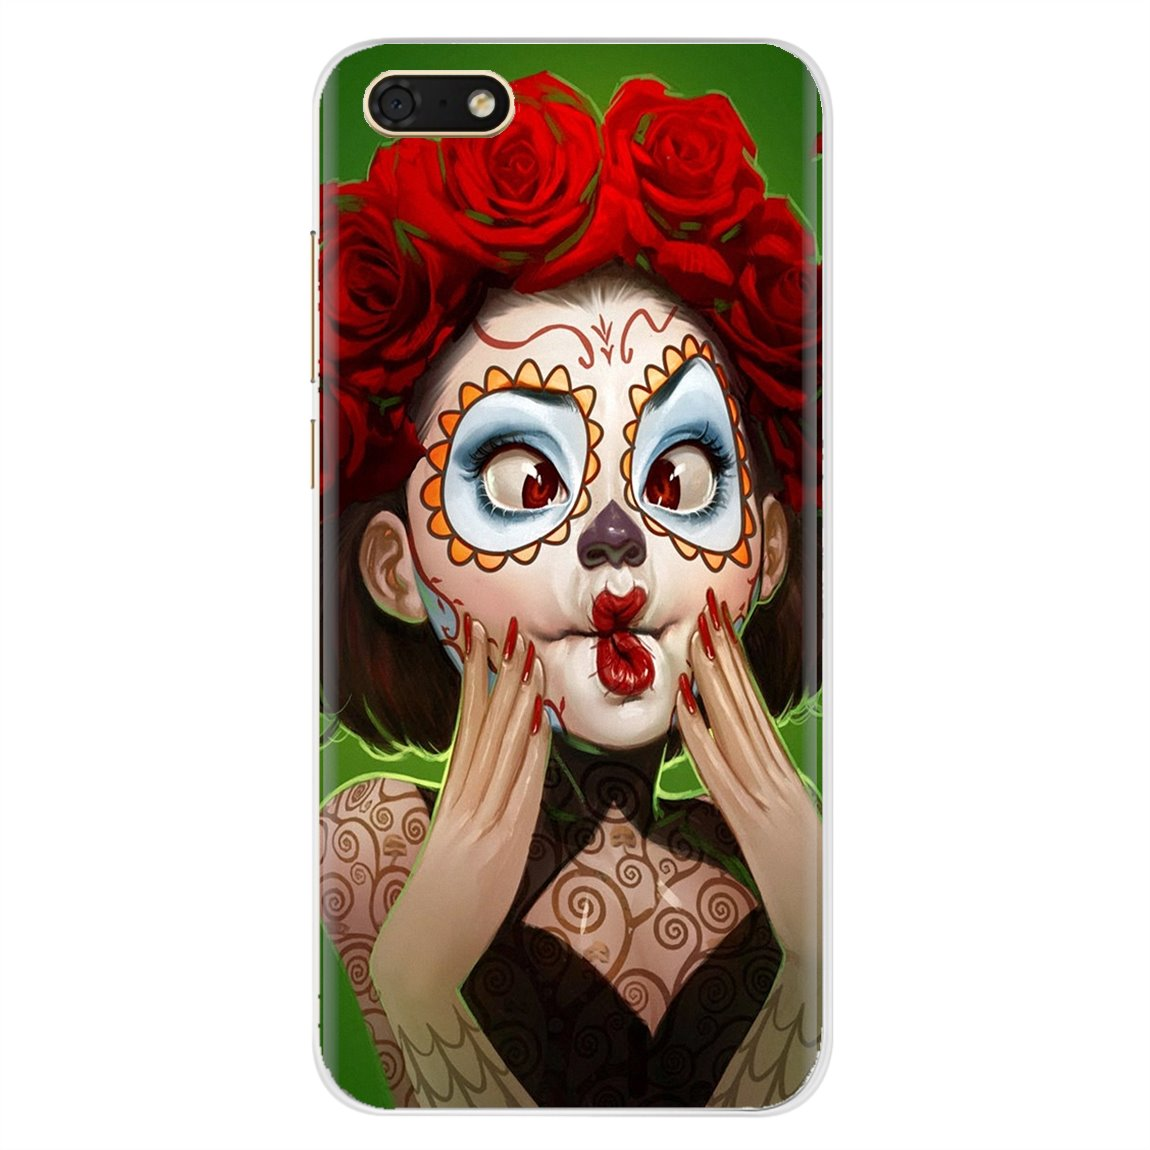 Personalizado Caso de Telefone Silicone catrina menina Flor Para Samsung Galaxy Note 2 3 4 5 8 9 S2 S3 S4 S5 Mini S6 S7 Borda S8 S9 Plus